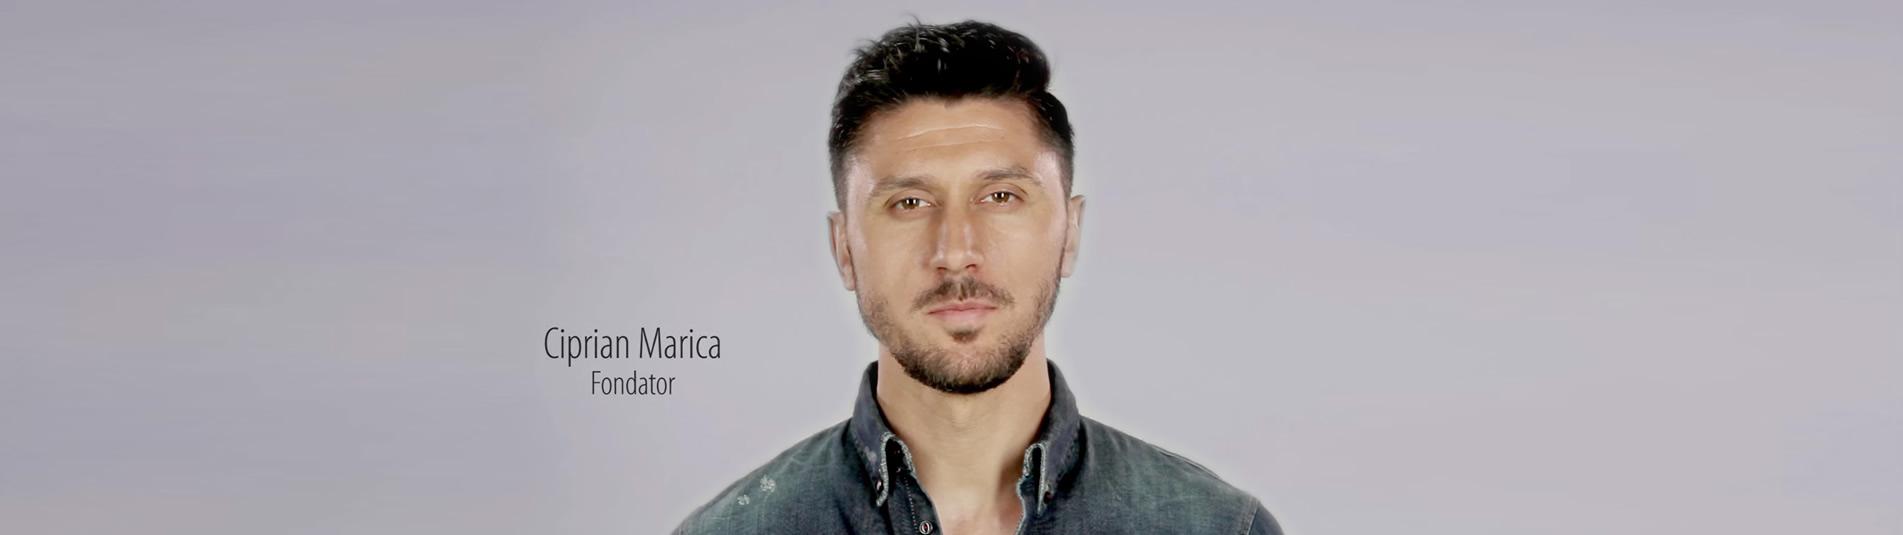 Ciprian Marica Foundation presentation clip